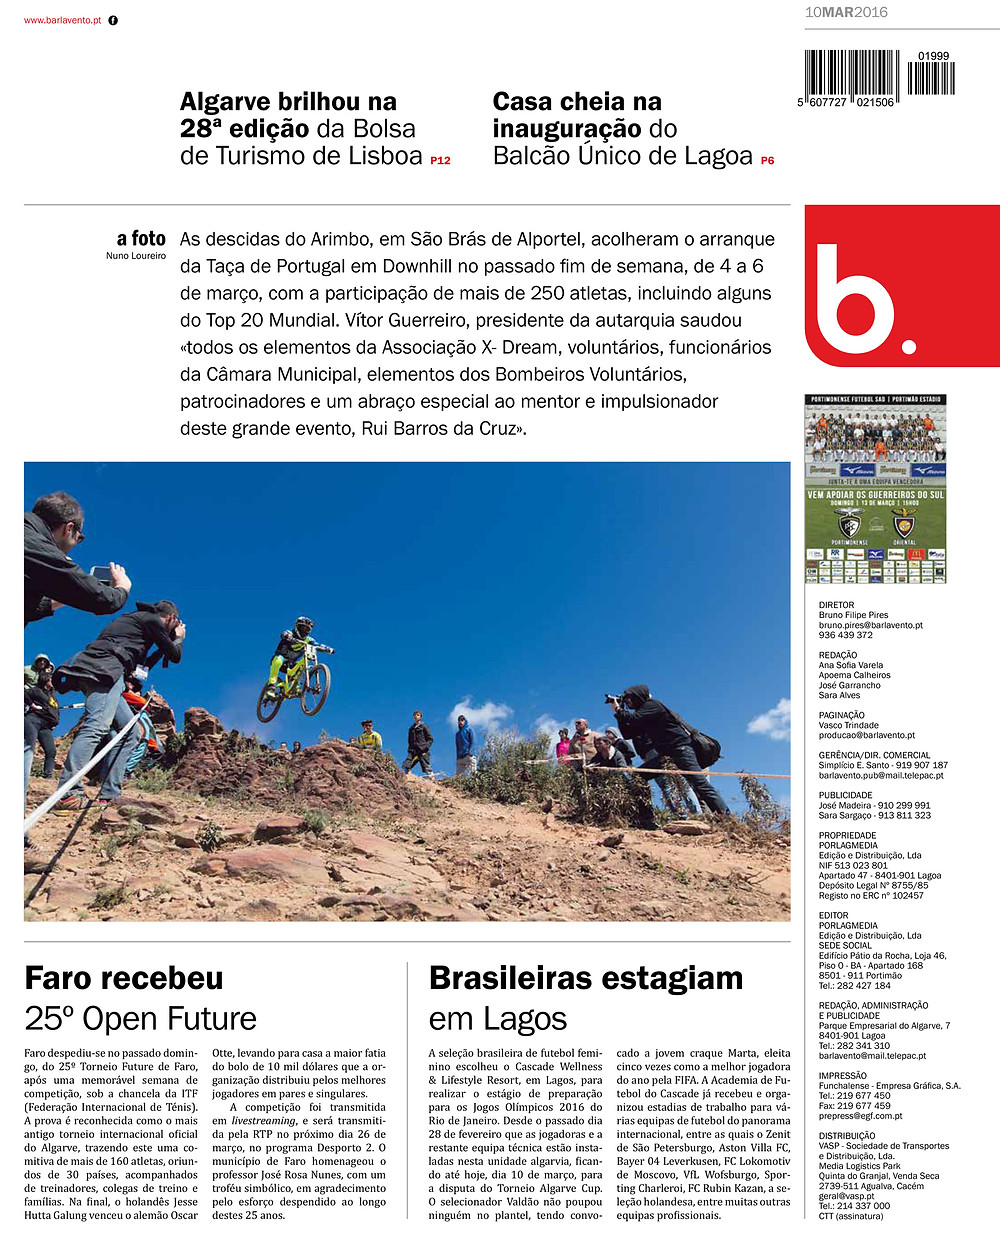 Barlavento - ed.º 1999 - 10 Março 2016 - pág. 24